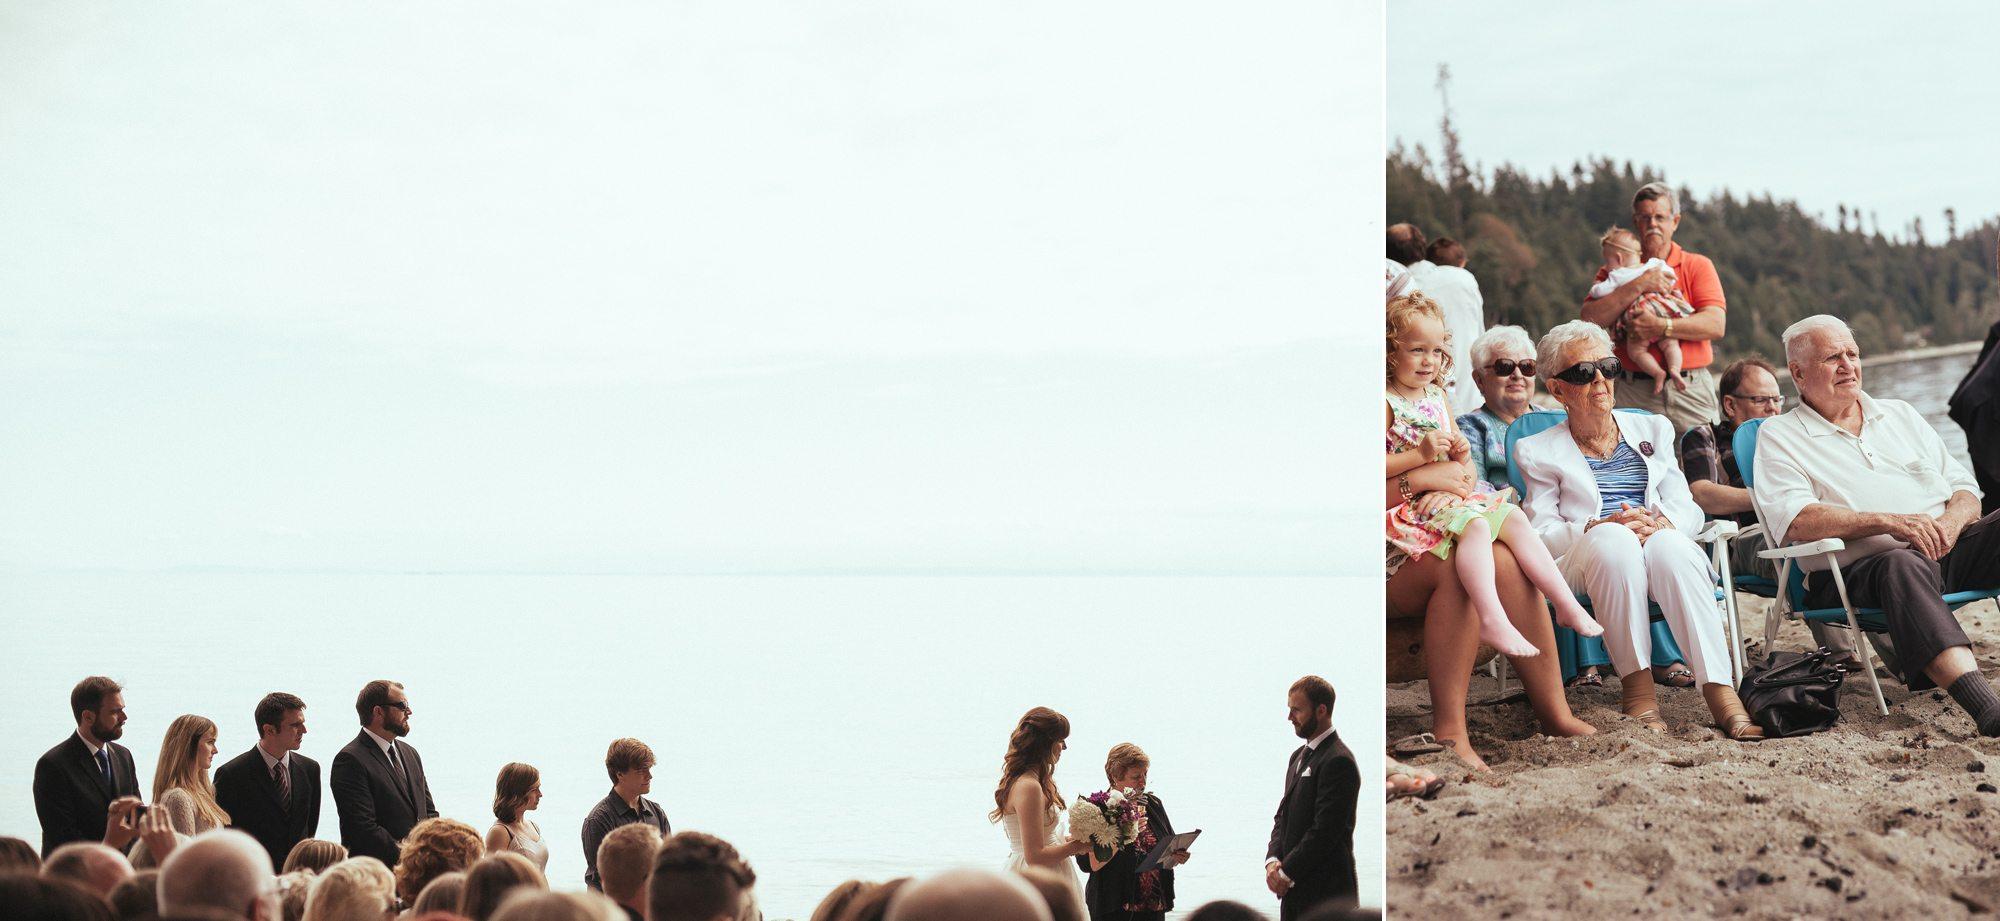 gibsons-wedding-photography-robert-devon21